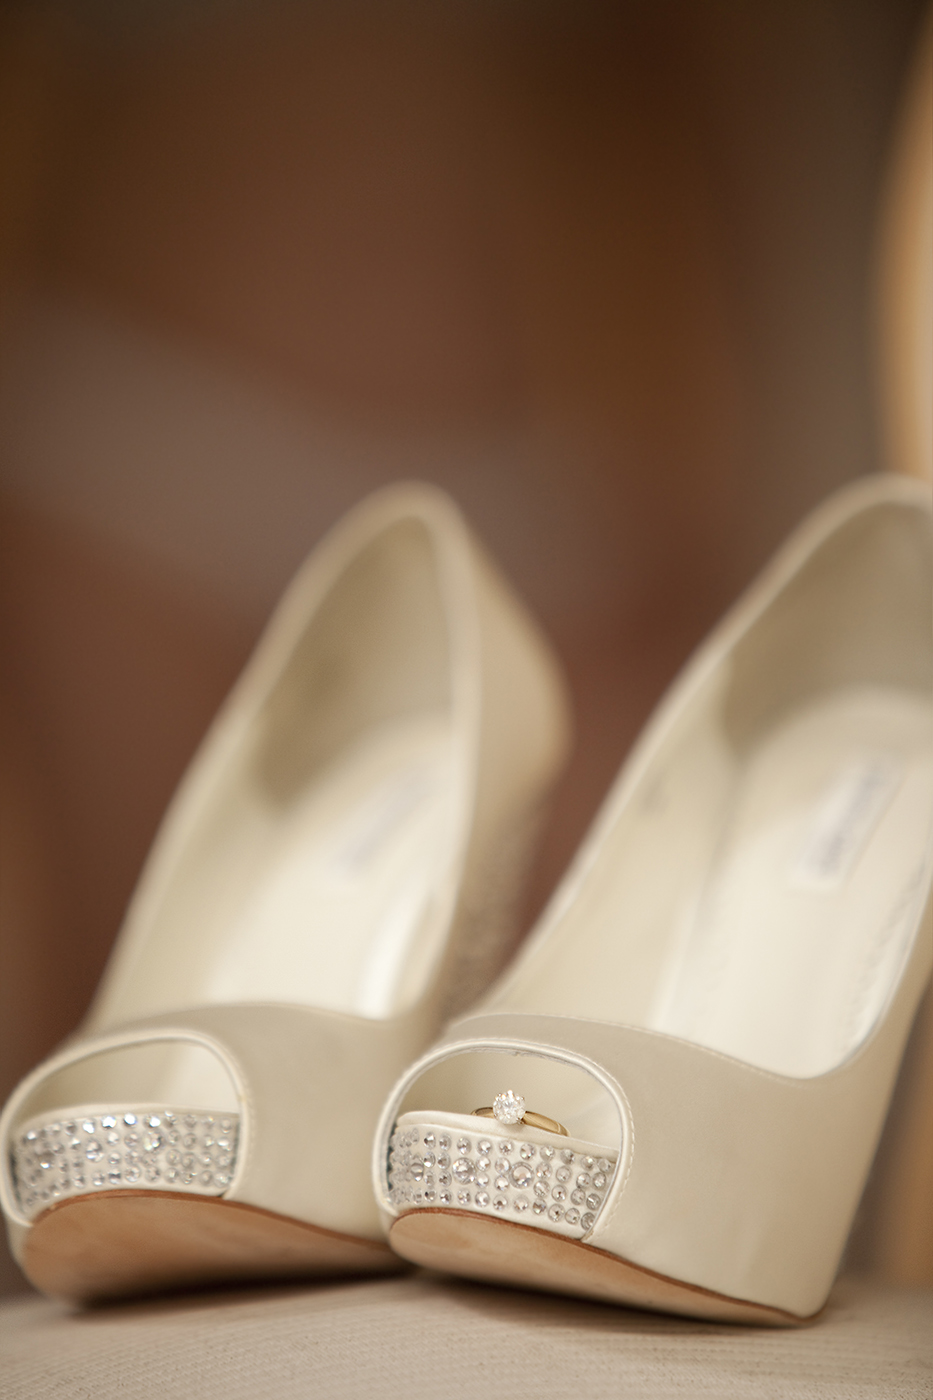 #boudoir #wedding #photographers #photography #photo #bouior